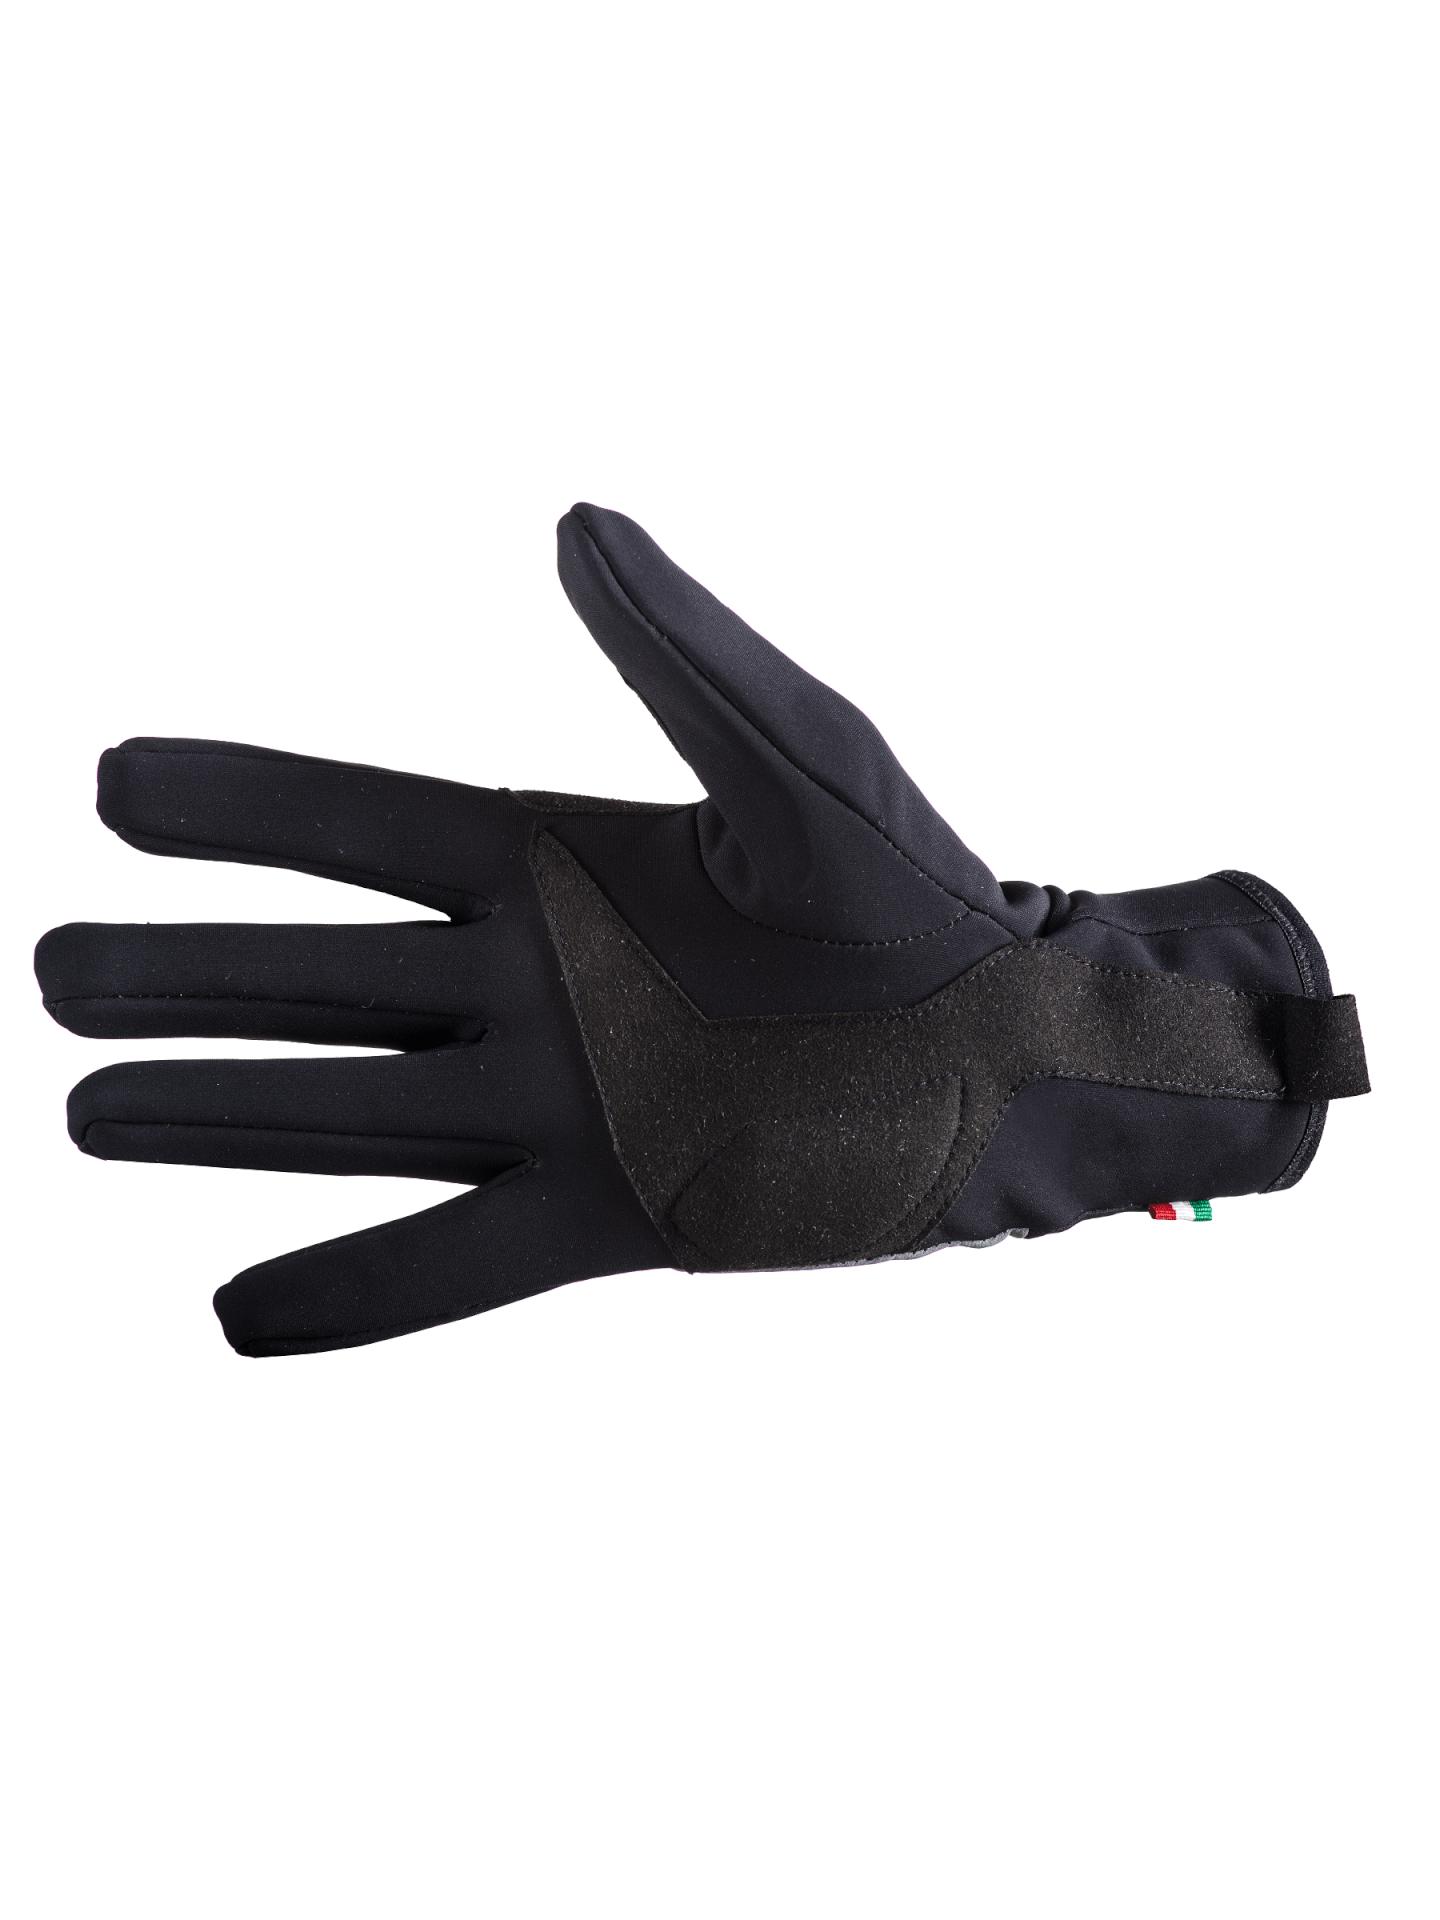 Radhandschuhe Termico Glove